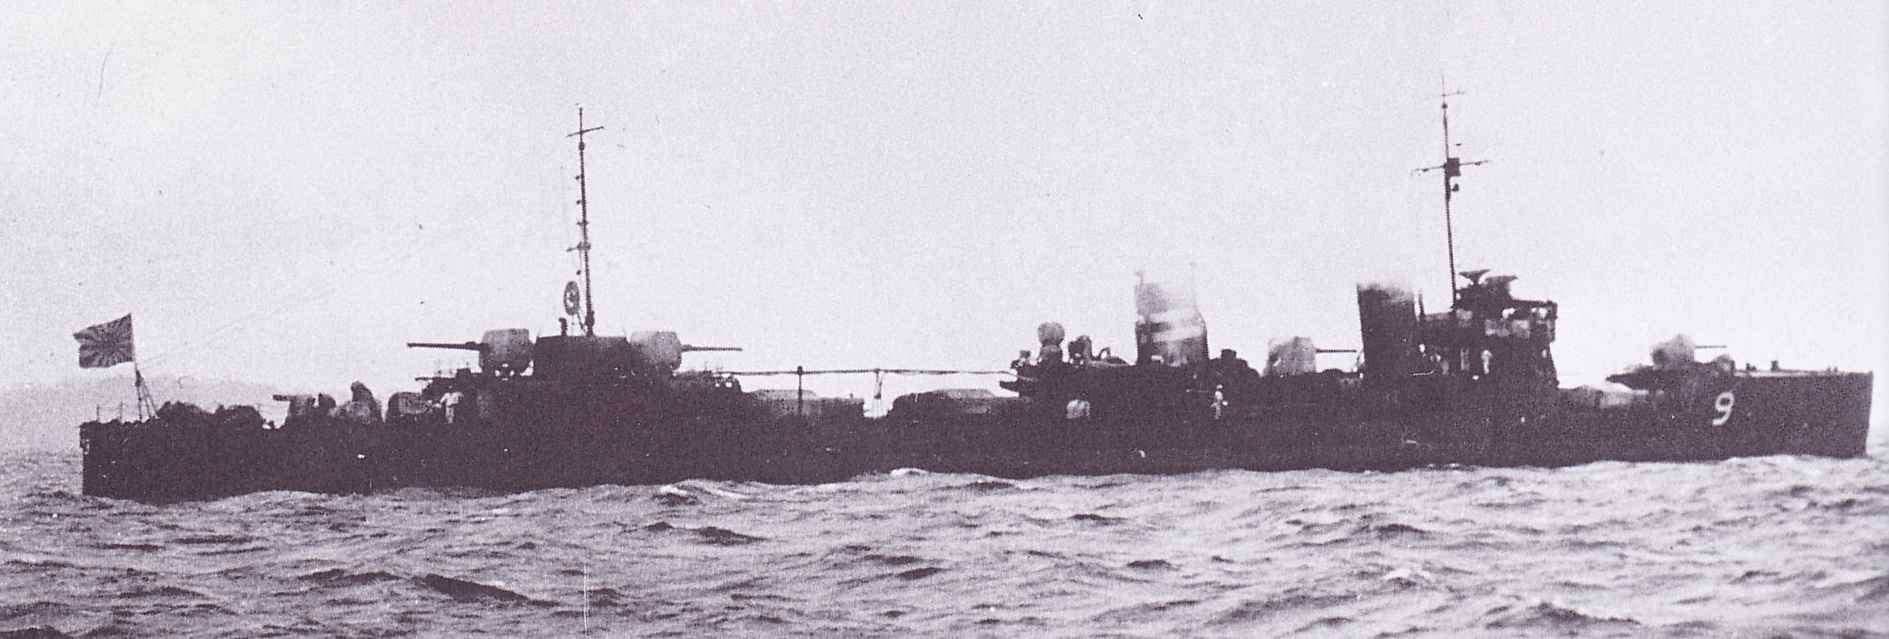 https://upload.wikimedia.org/wikipedia/commons/7/7b/Japanese_destroyer_Hatakaze_Taisho_14.jpg